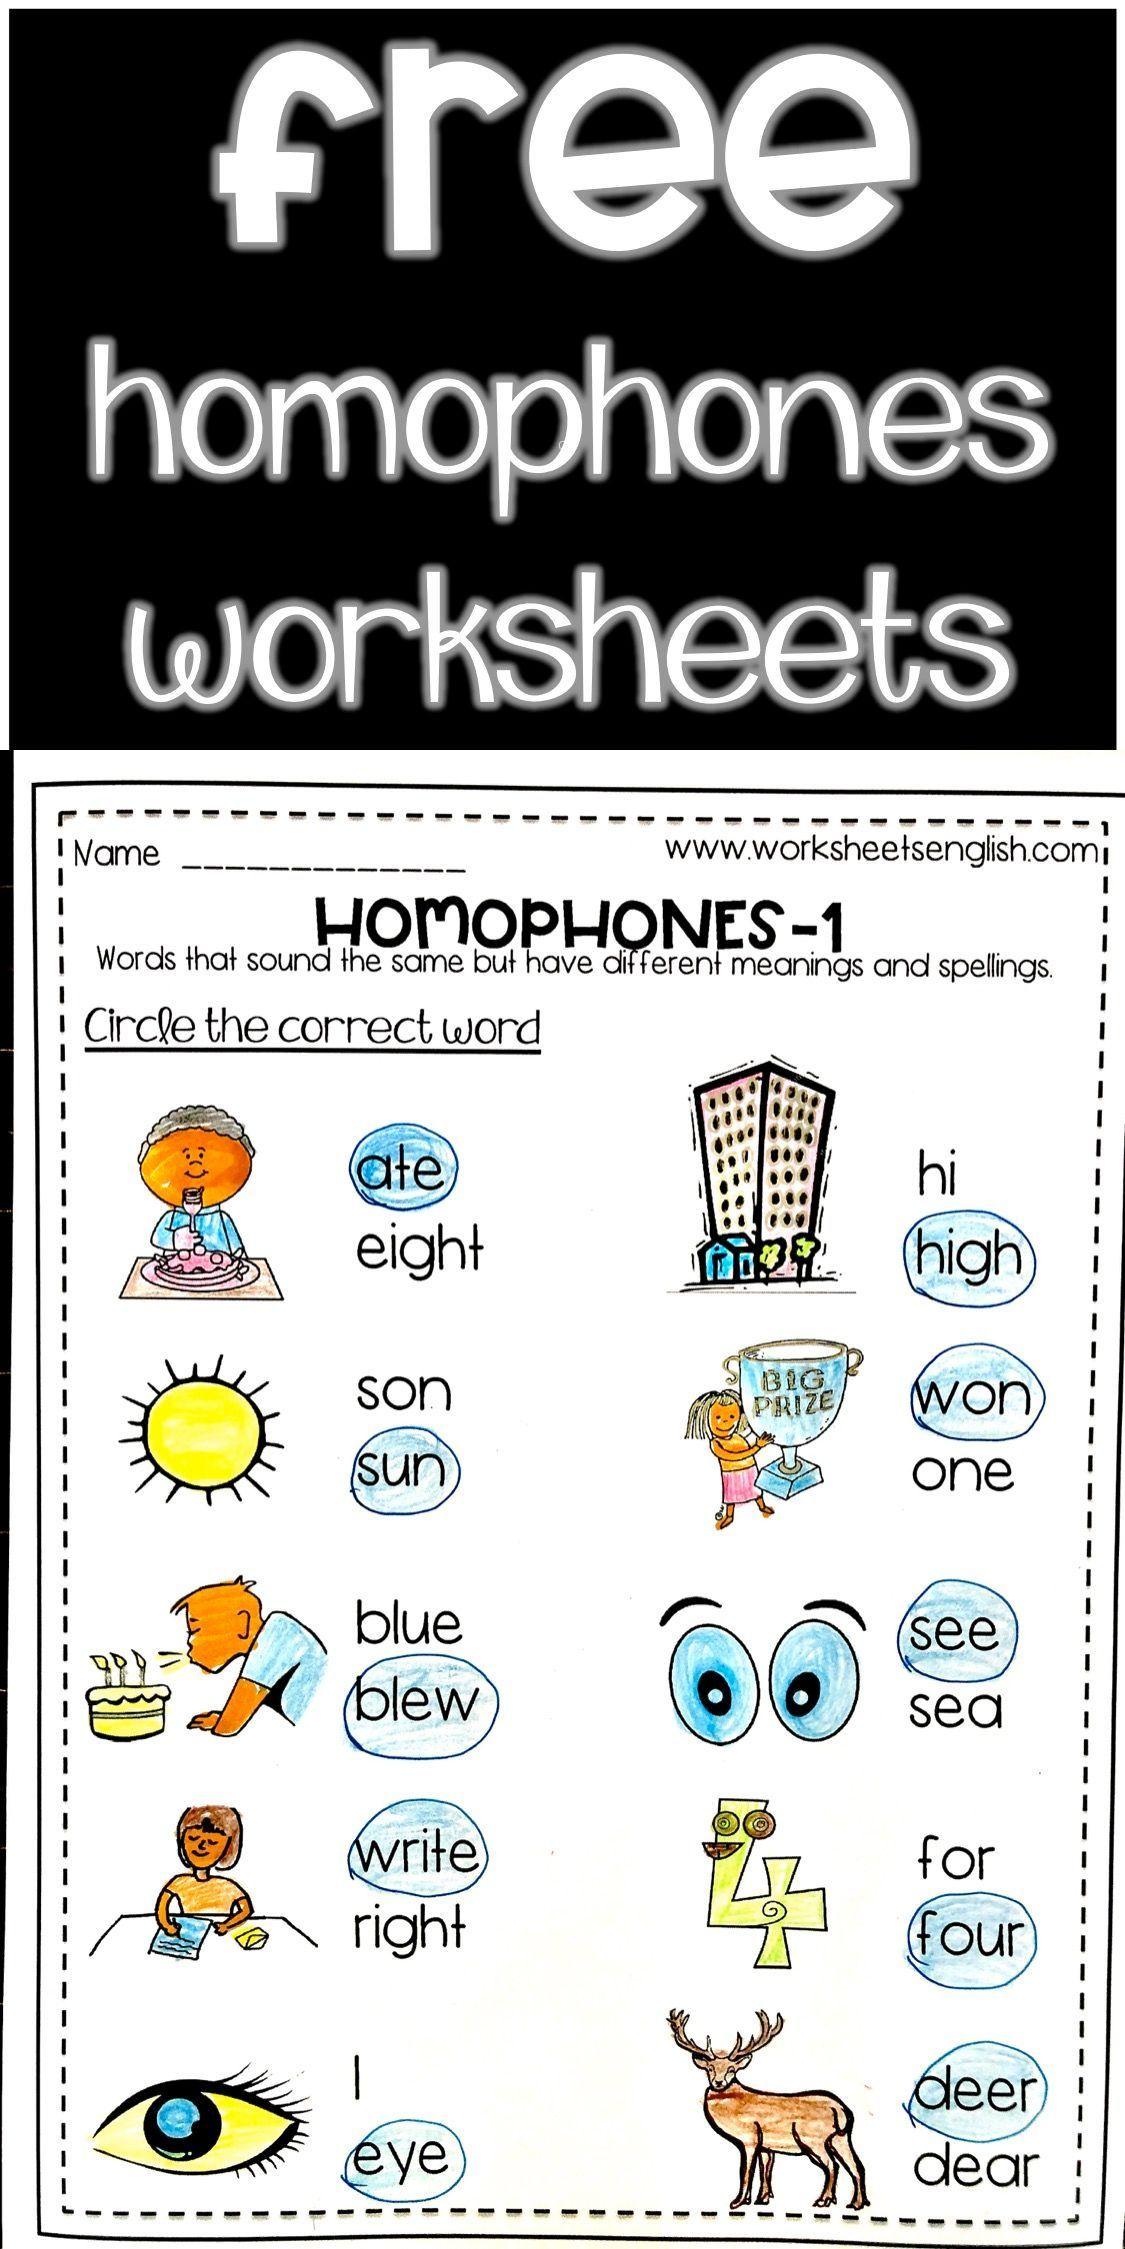 Homophones Worksheet And Exercises Free Www Worksheetsenglish Com In 2021 Homophones Worksheets Homophones Worksheets